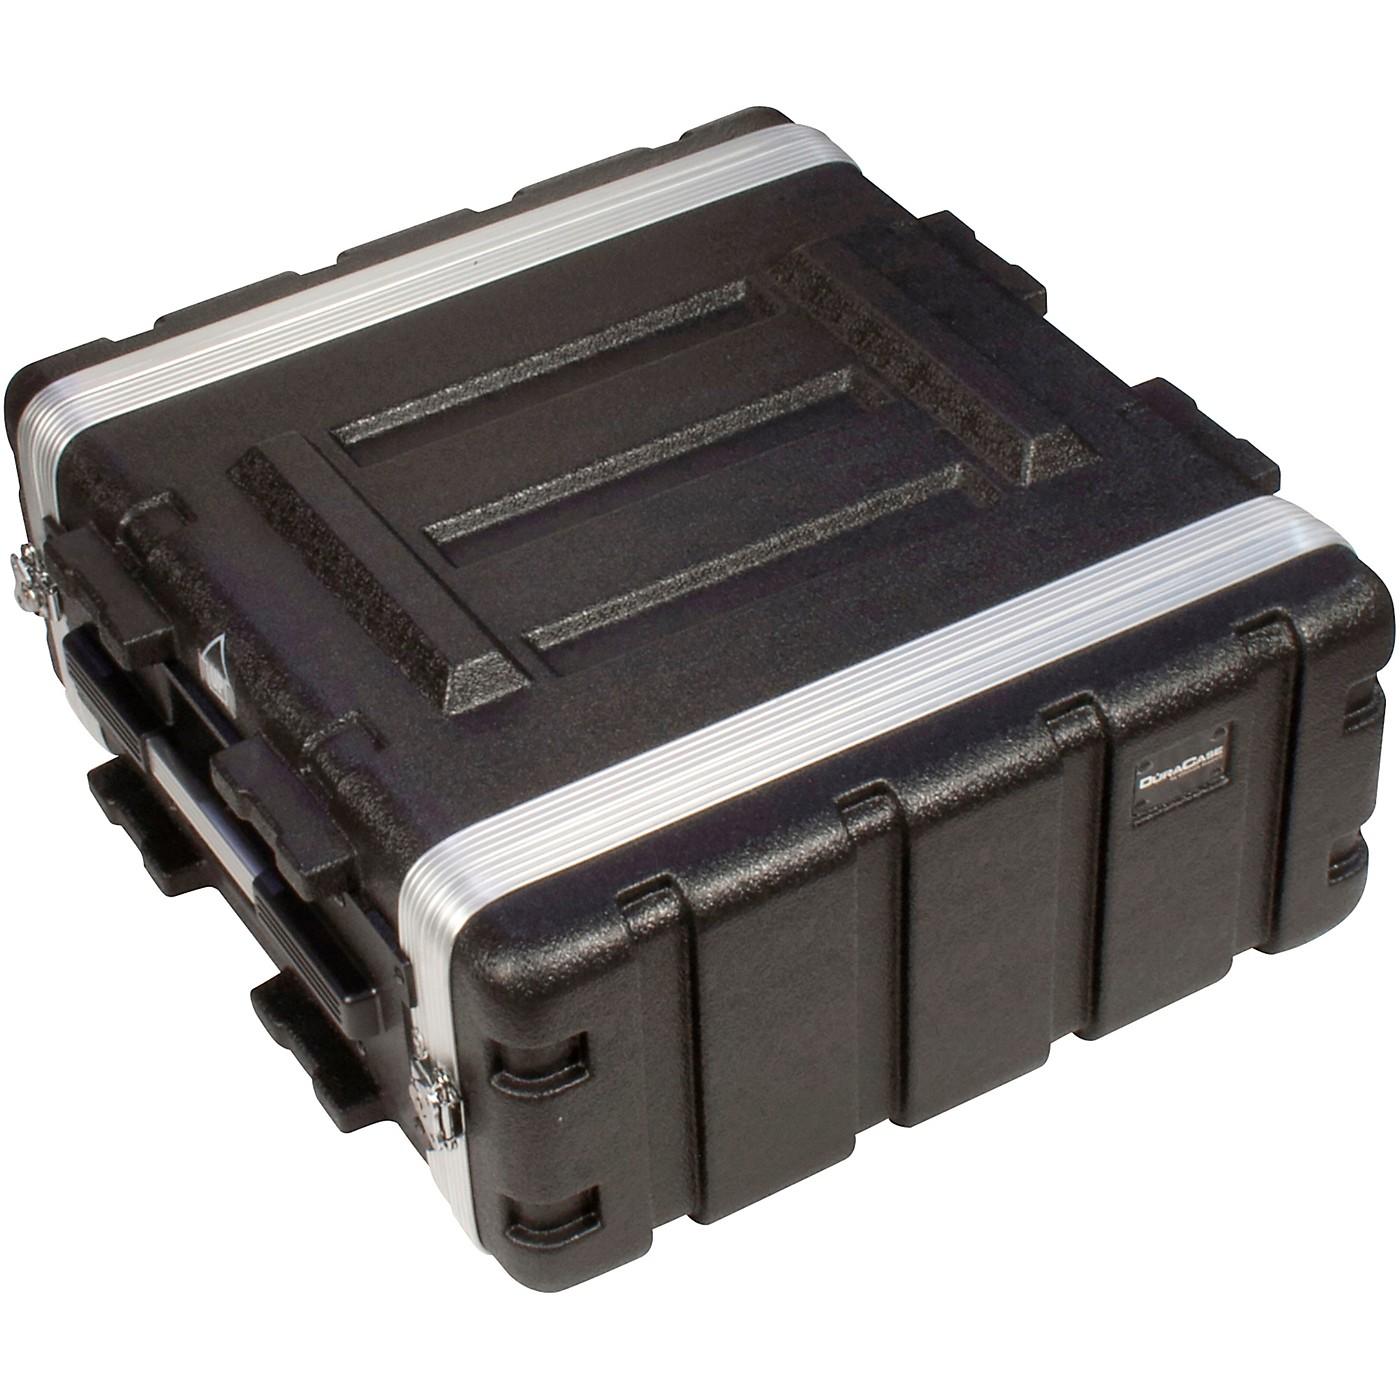 Ultimate Support DuraCase UR-4L Portable 4-Space Rackmount Case thumbnail